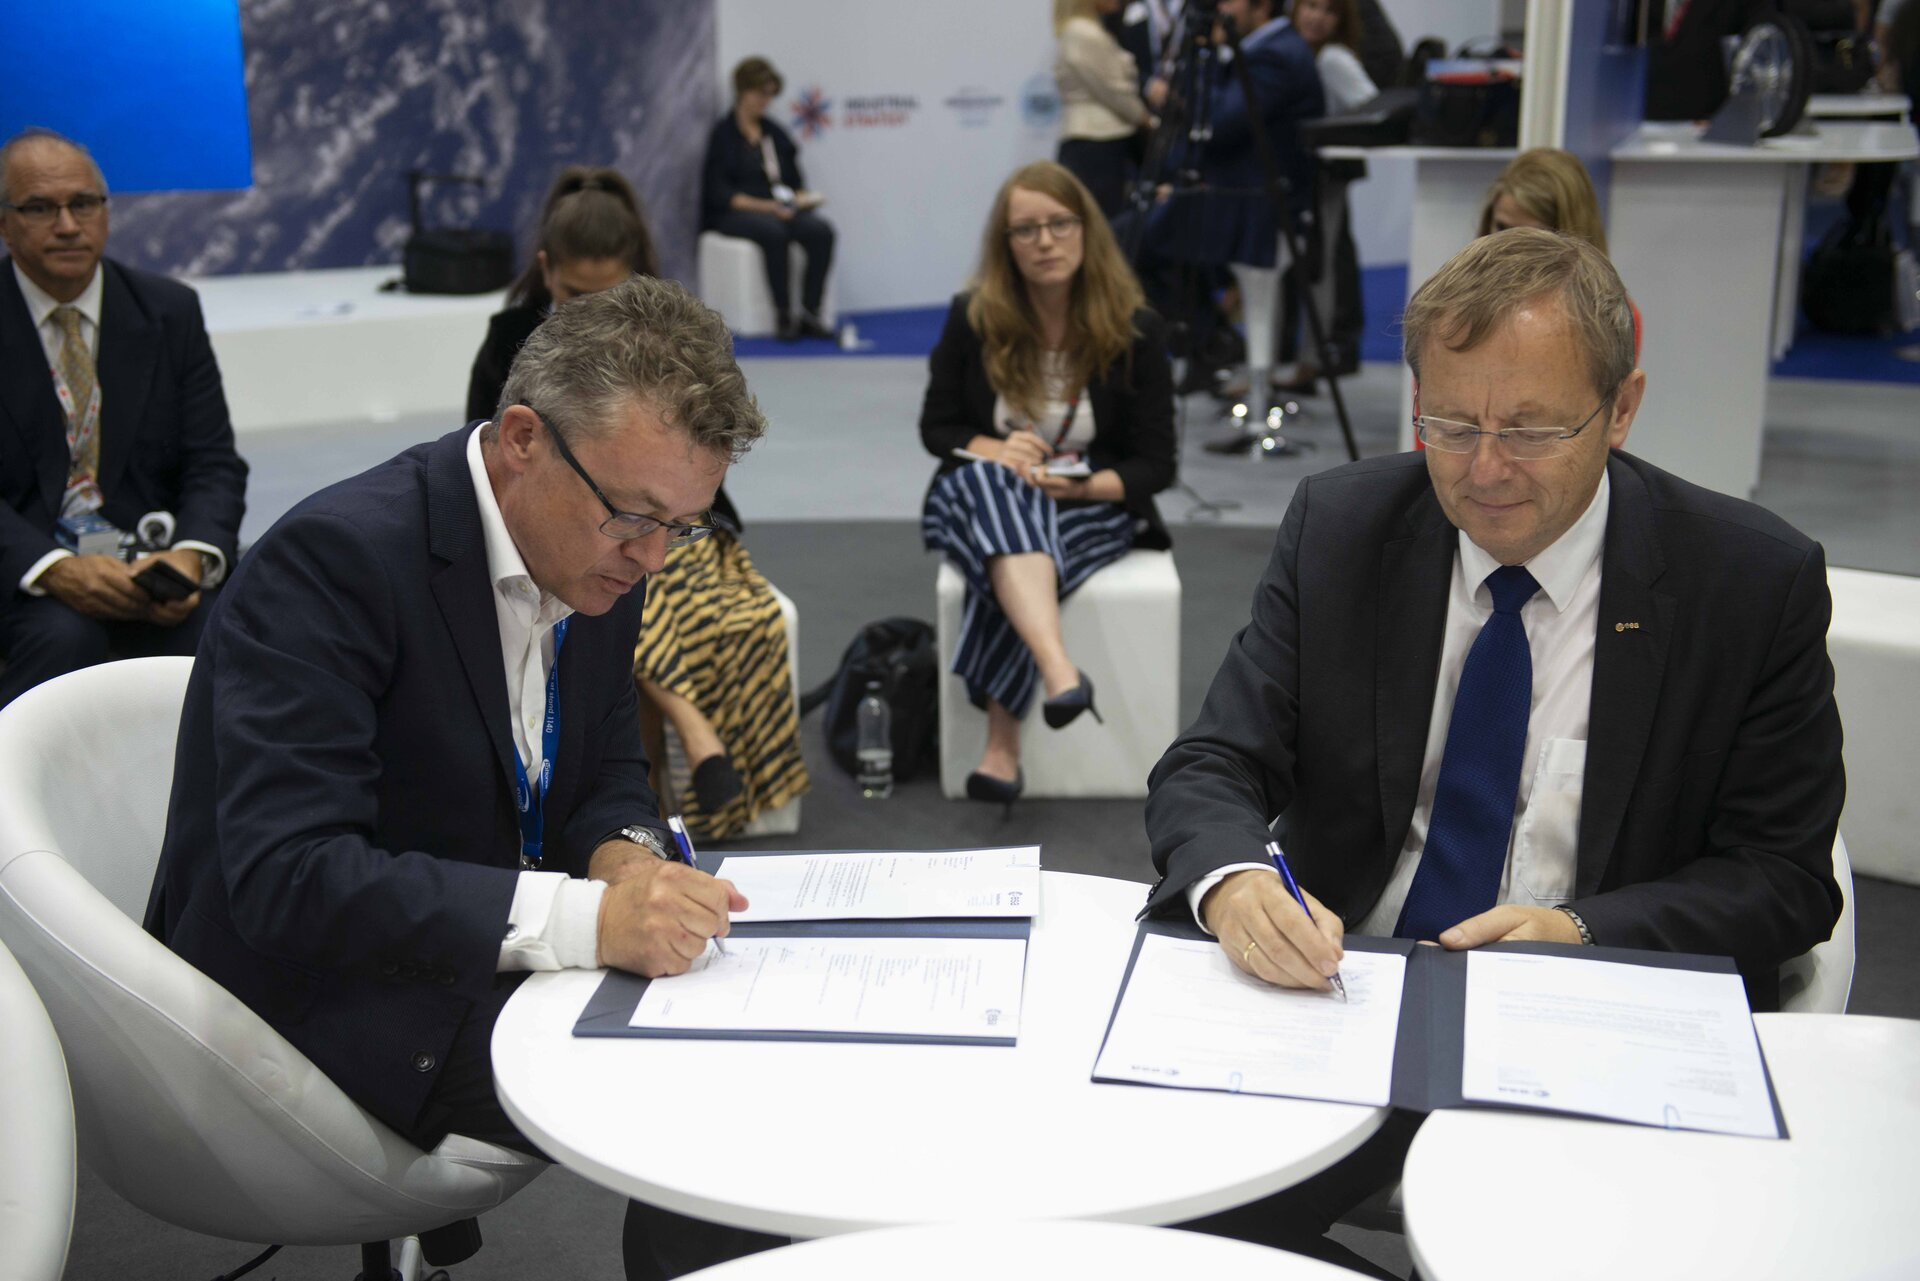 The Metalysis–ESA Grand Challenge launched at Farnborough International Airshow